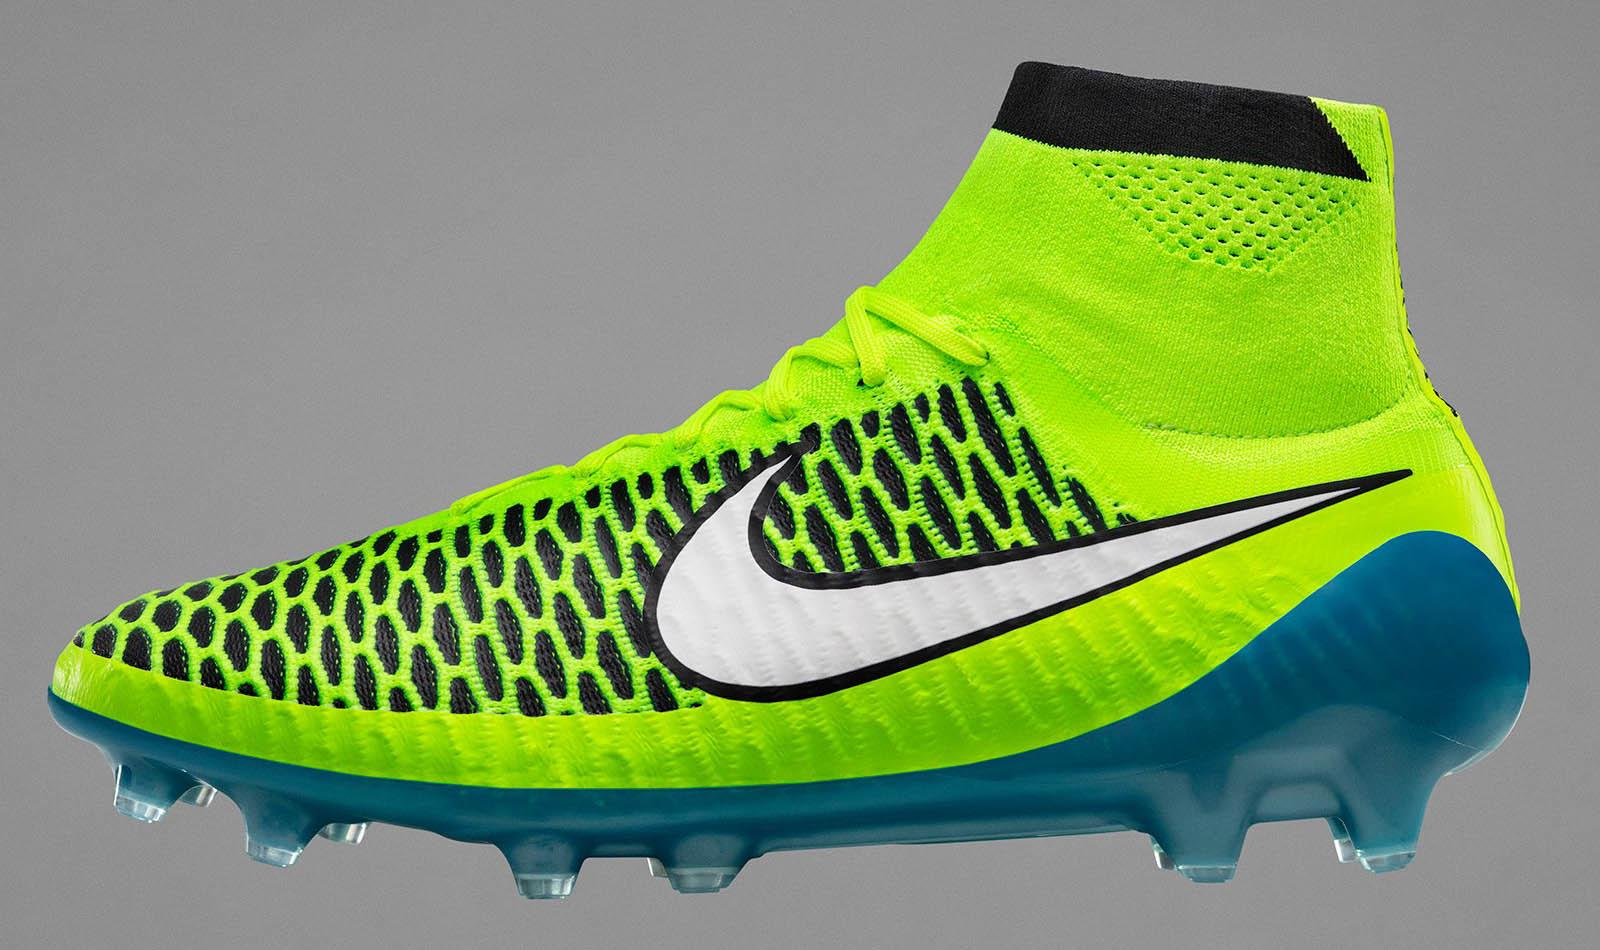 save off e5fe1 0fba7 Nike Magista Obra 2015 Women s Boots Released